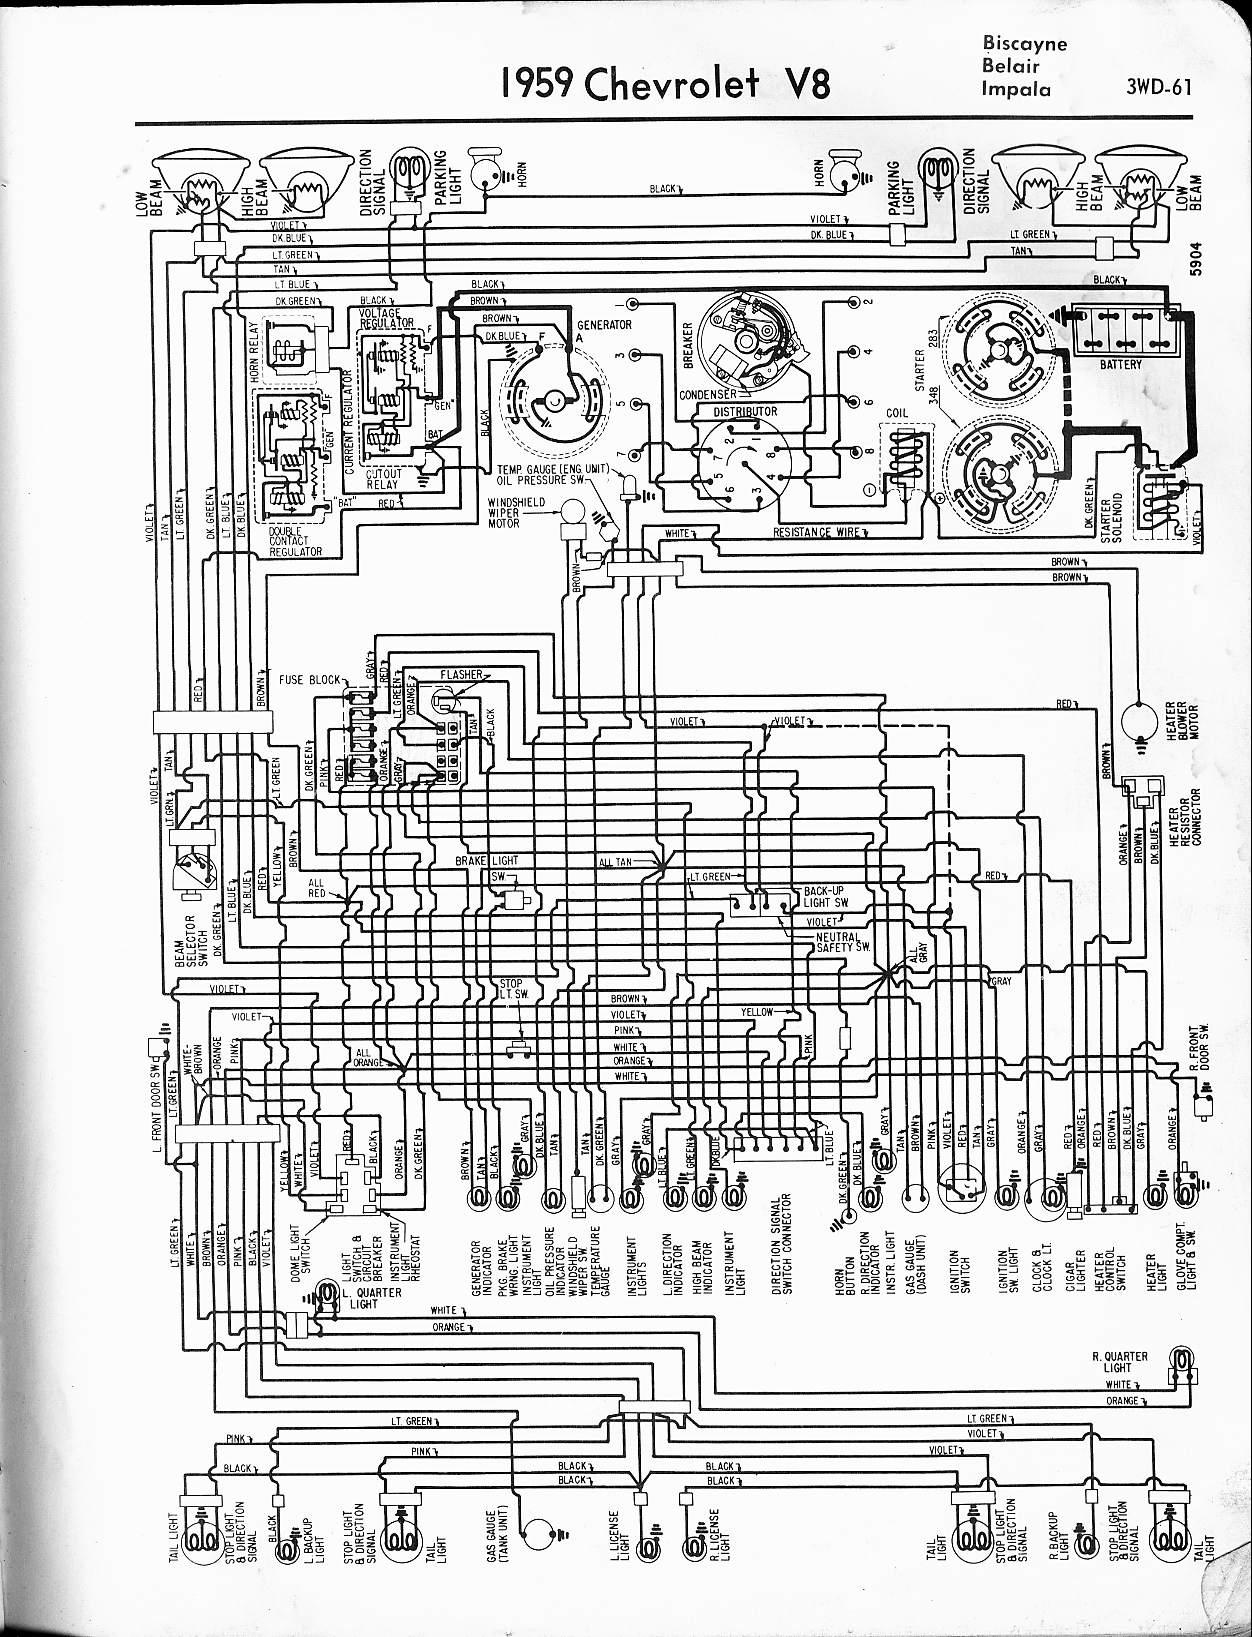 1961 Chevrolet Apache Wiring Diagram 1961 Chevy Apache Parts 1961 Chevrolet Apache  Wiring Diagram